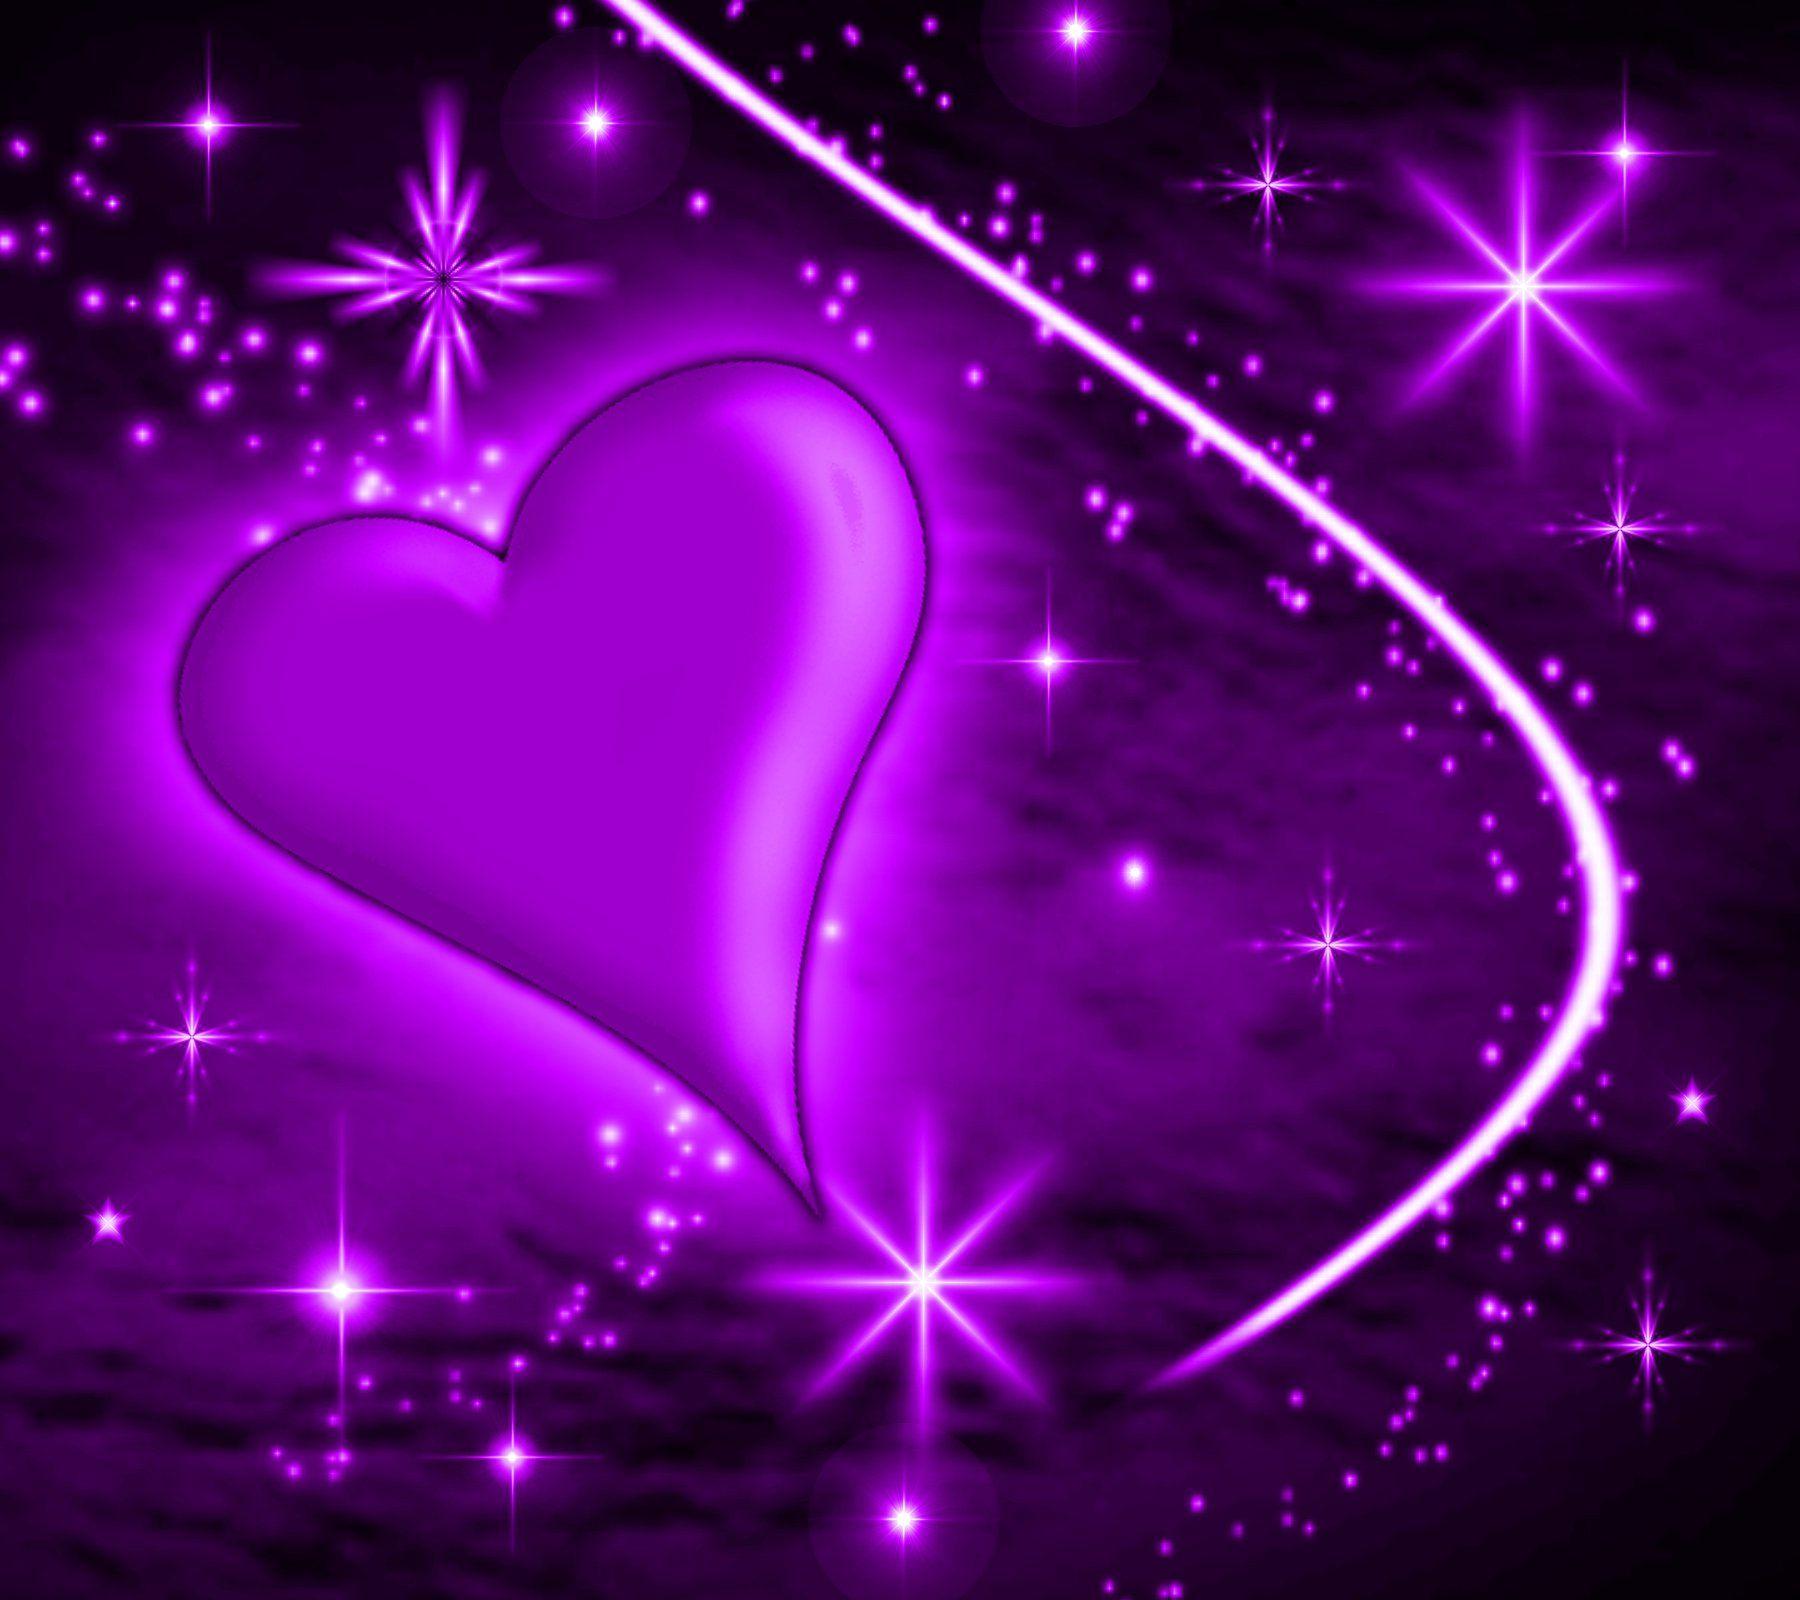 Purple Colorful Desktops | Background Wallpaper Image: Purple Heart ...